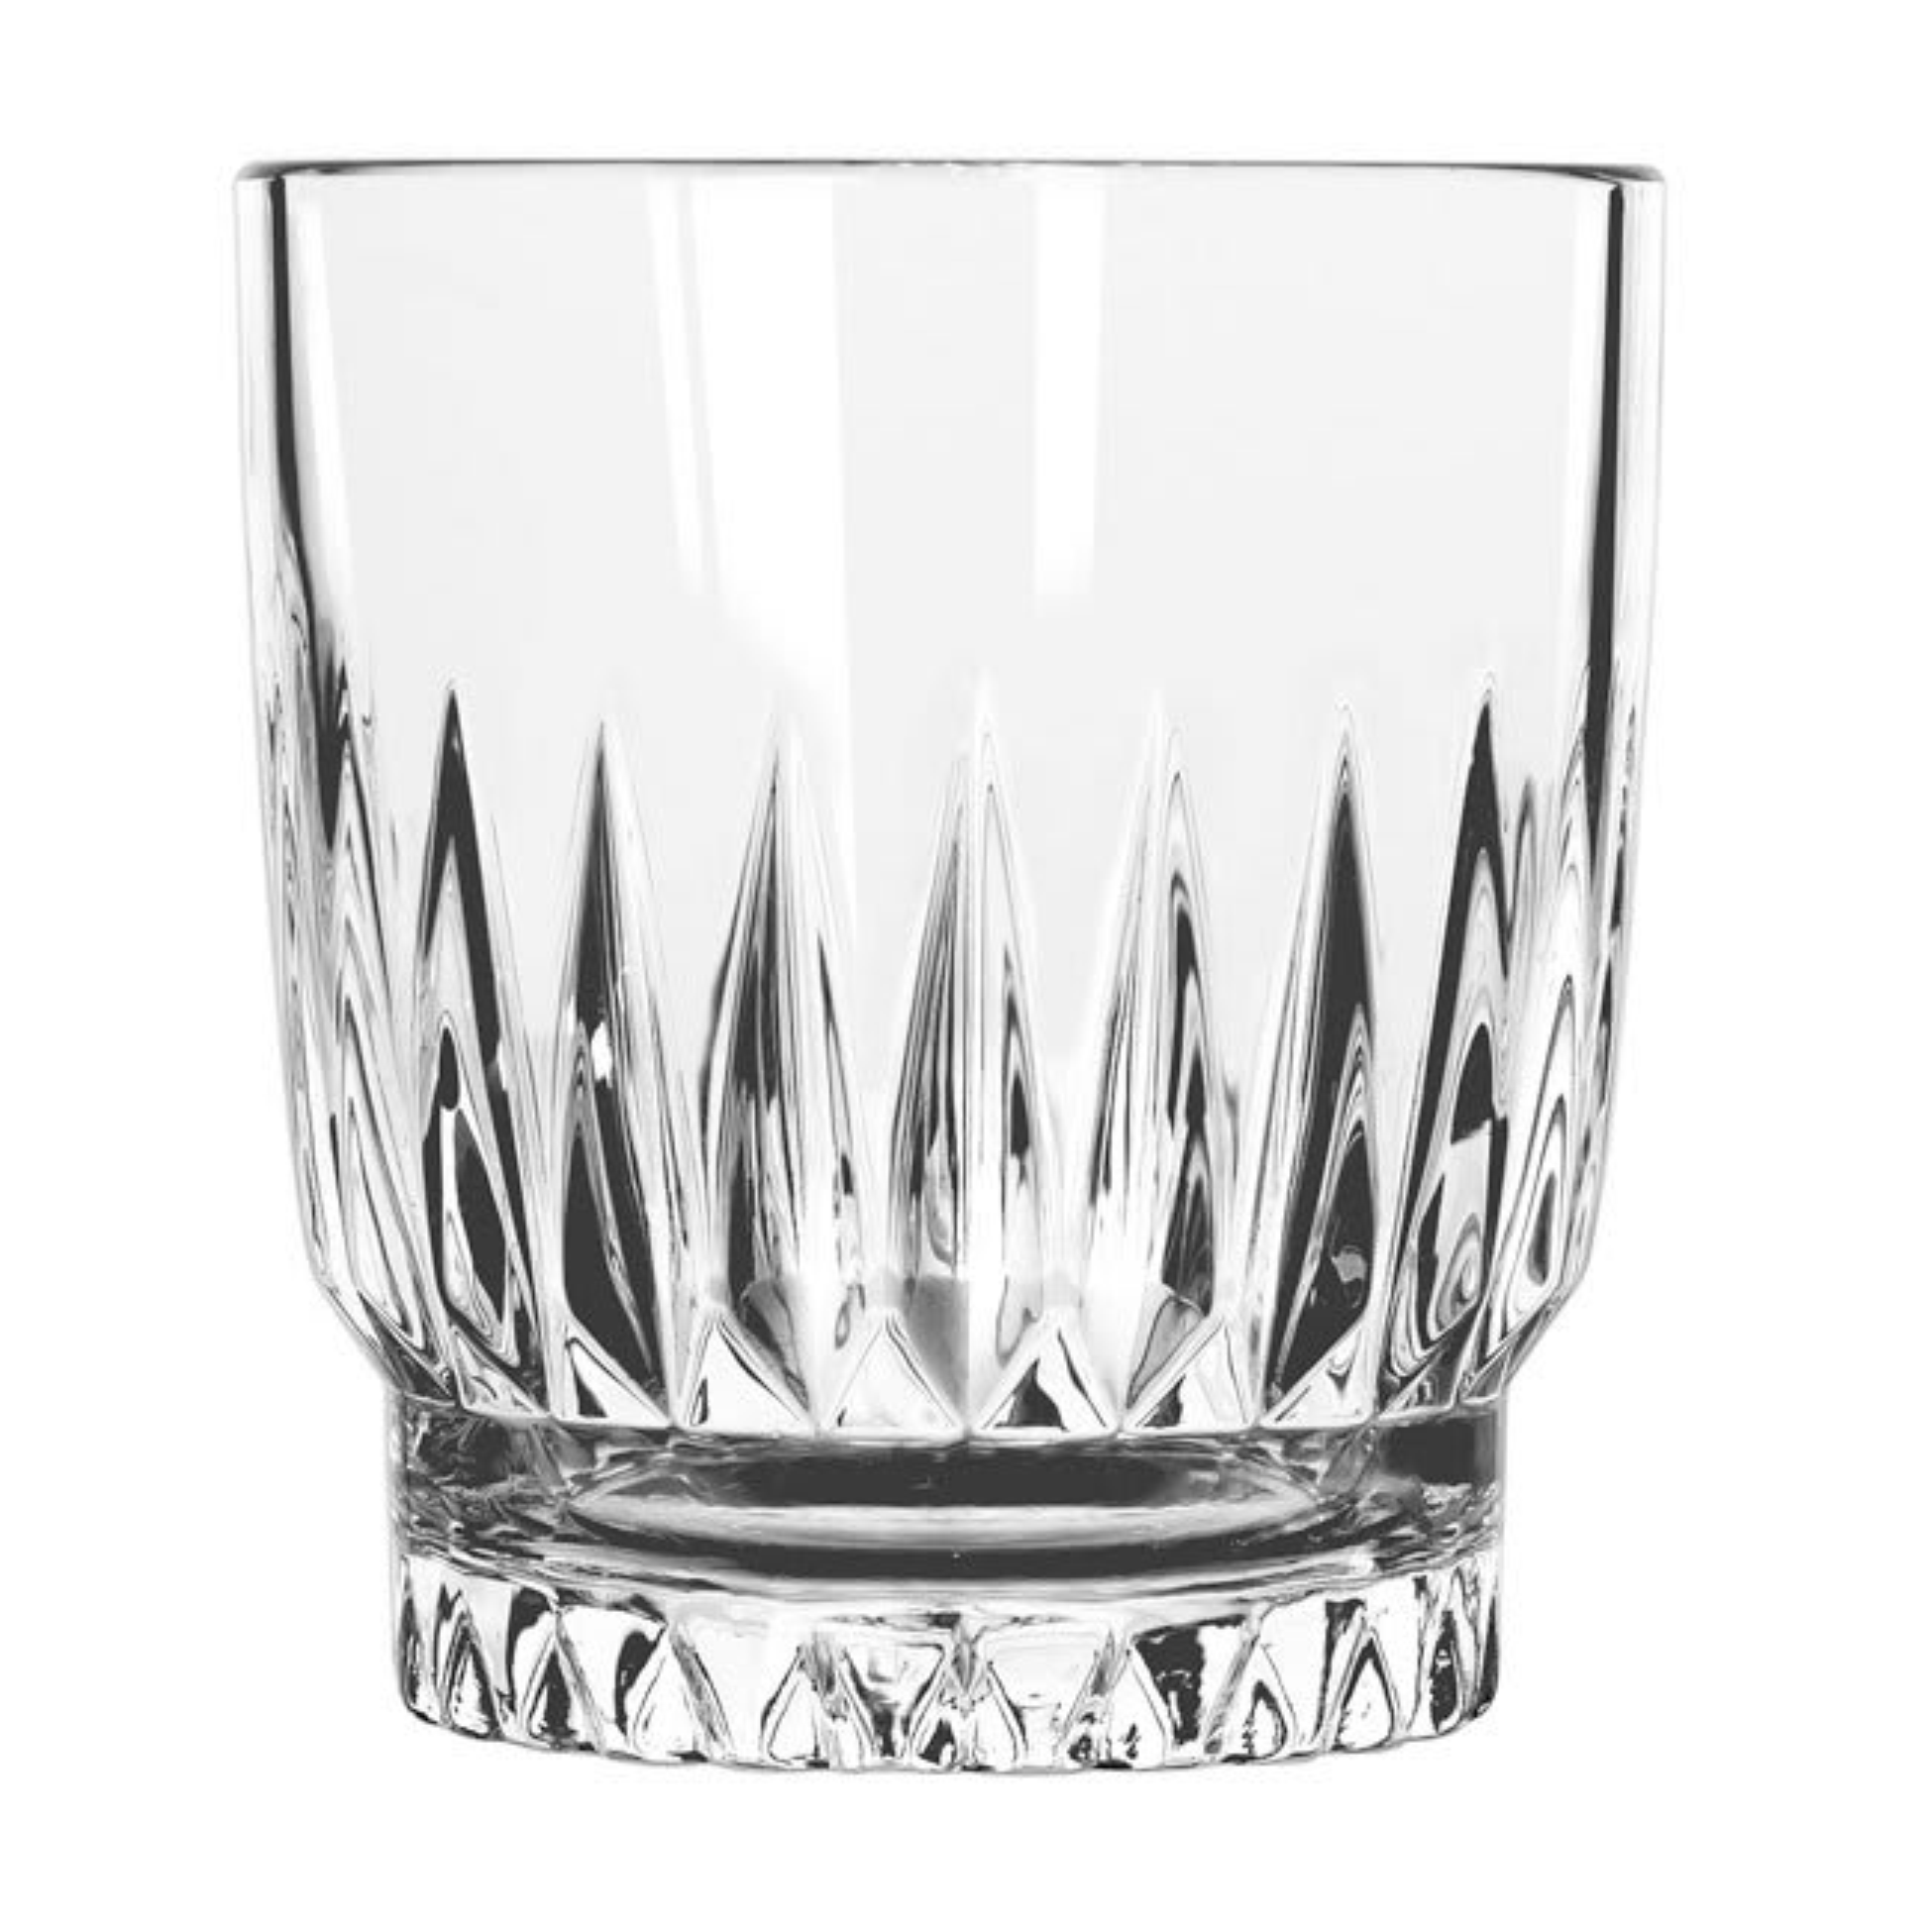 Libbey 15457 10 oz Rocks Glass - Winchester